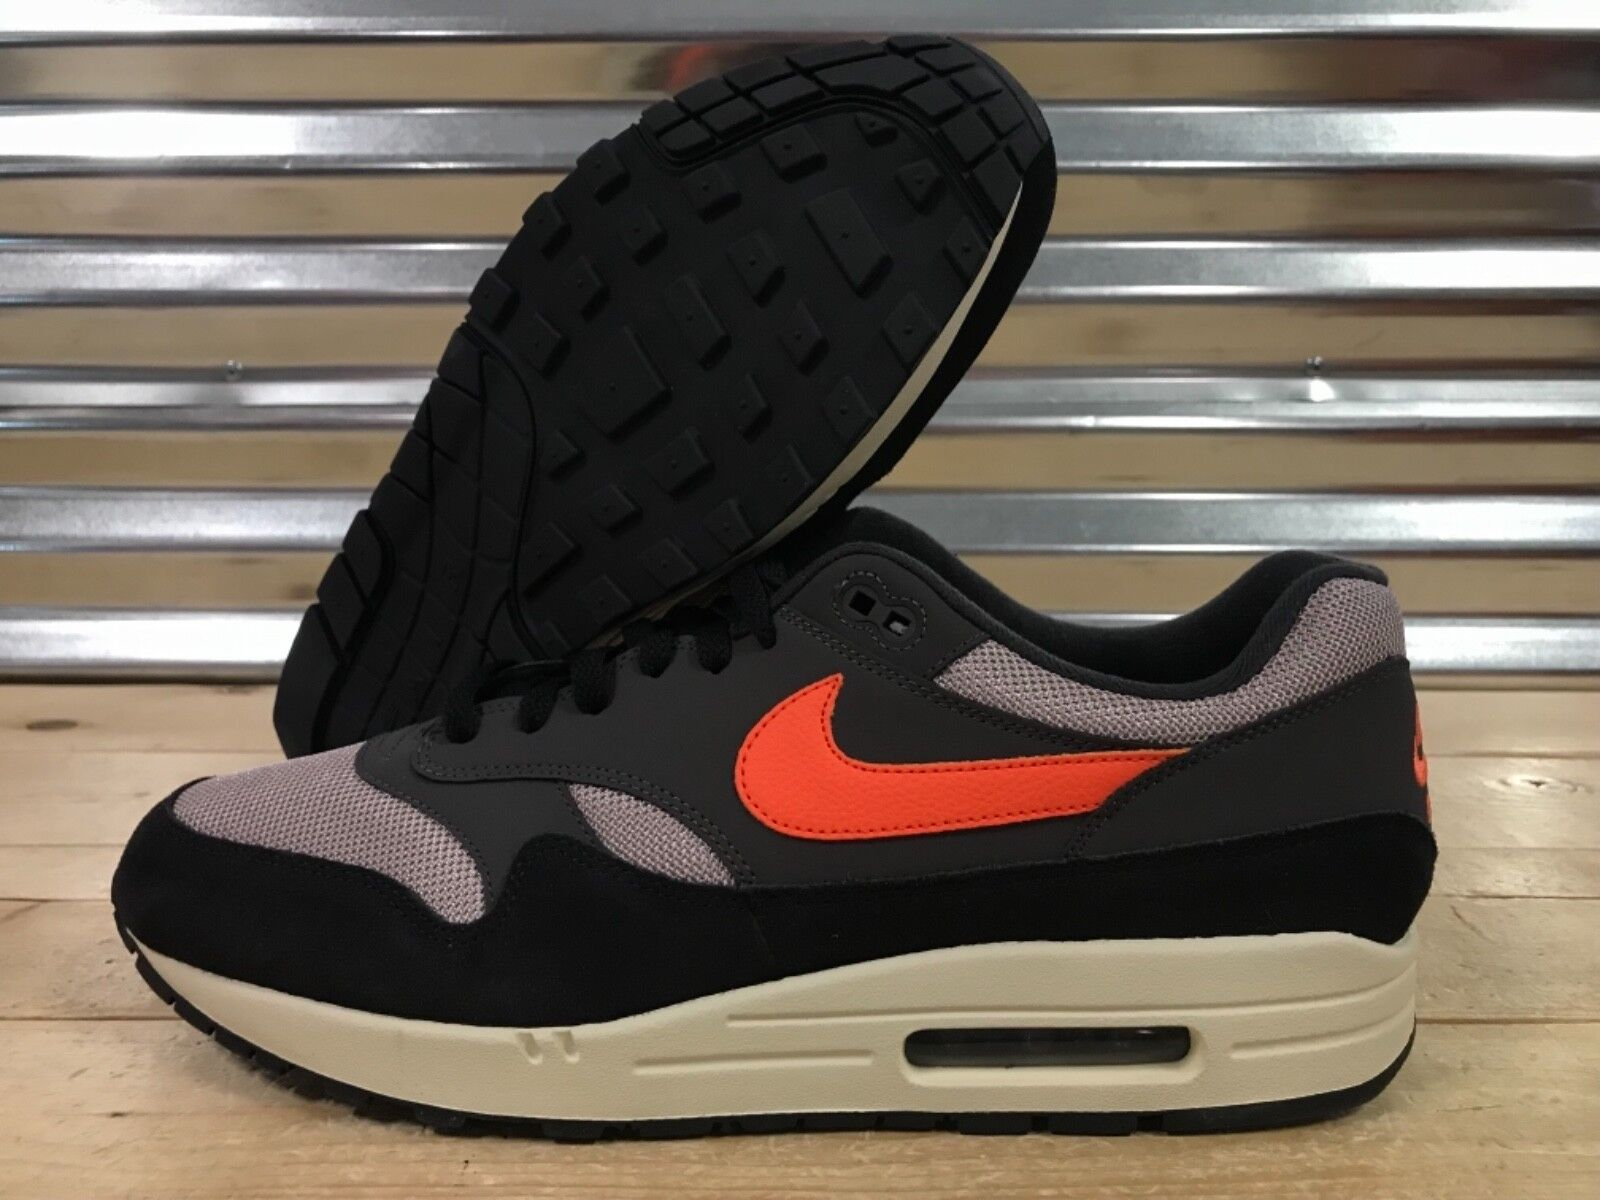 Nike Air Max 1 Running Shoes Oil Grey Tan Wild Mango Orange SZ ( AH8145 004 )